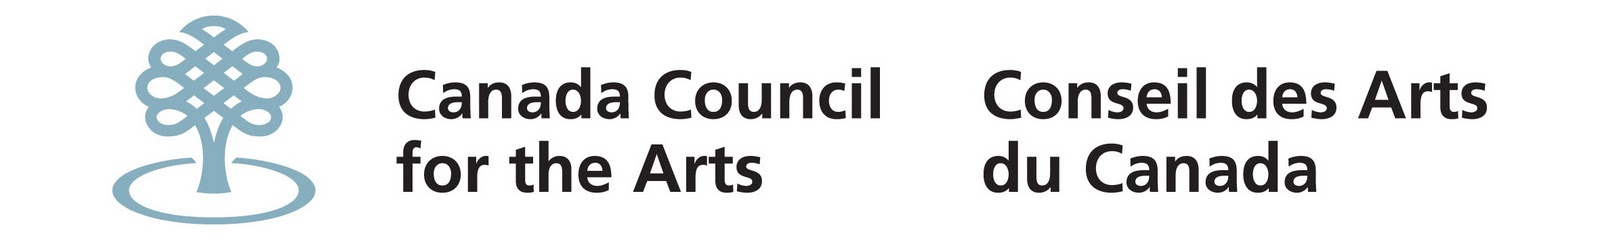 CCFA_Logo_ENG_col-new.jpg